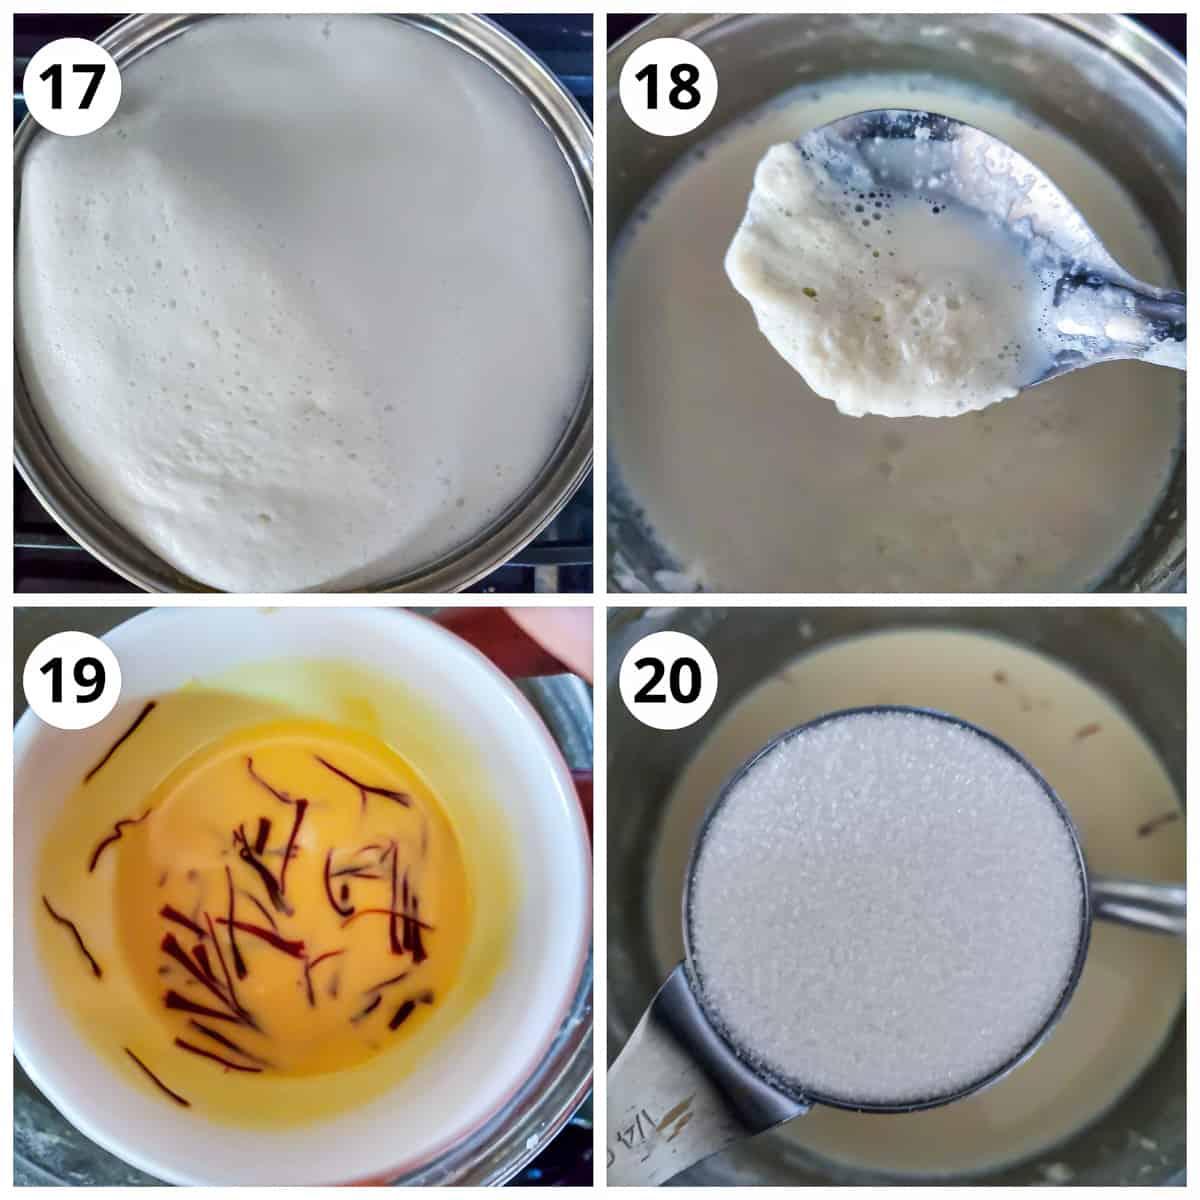 Bioling milk for Rabri